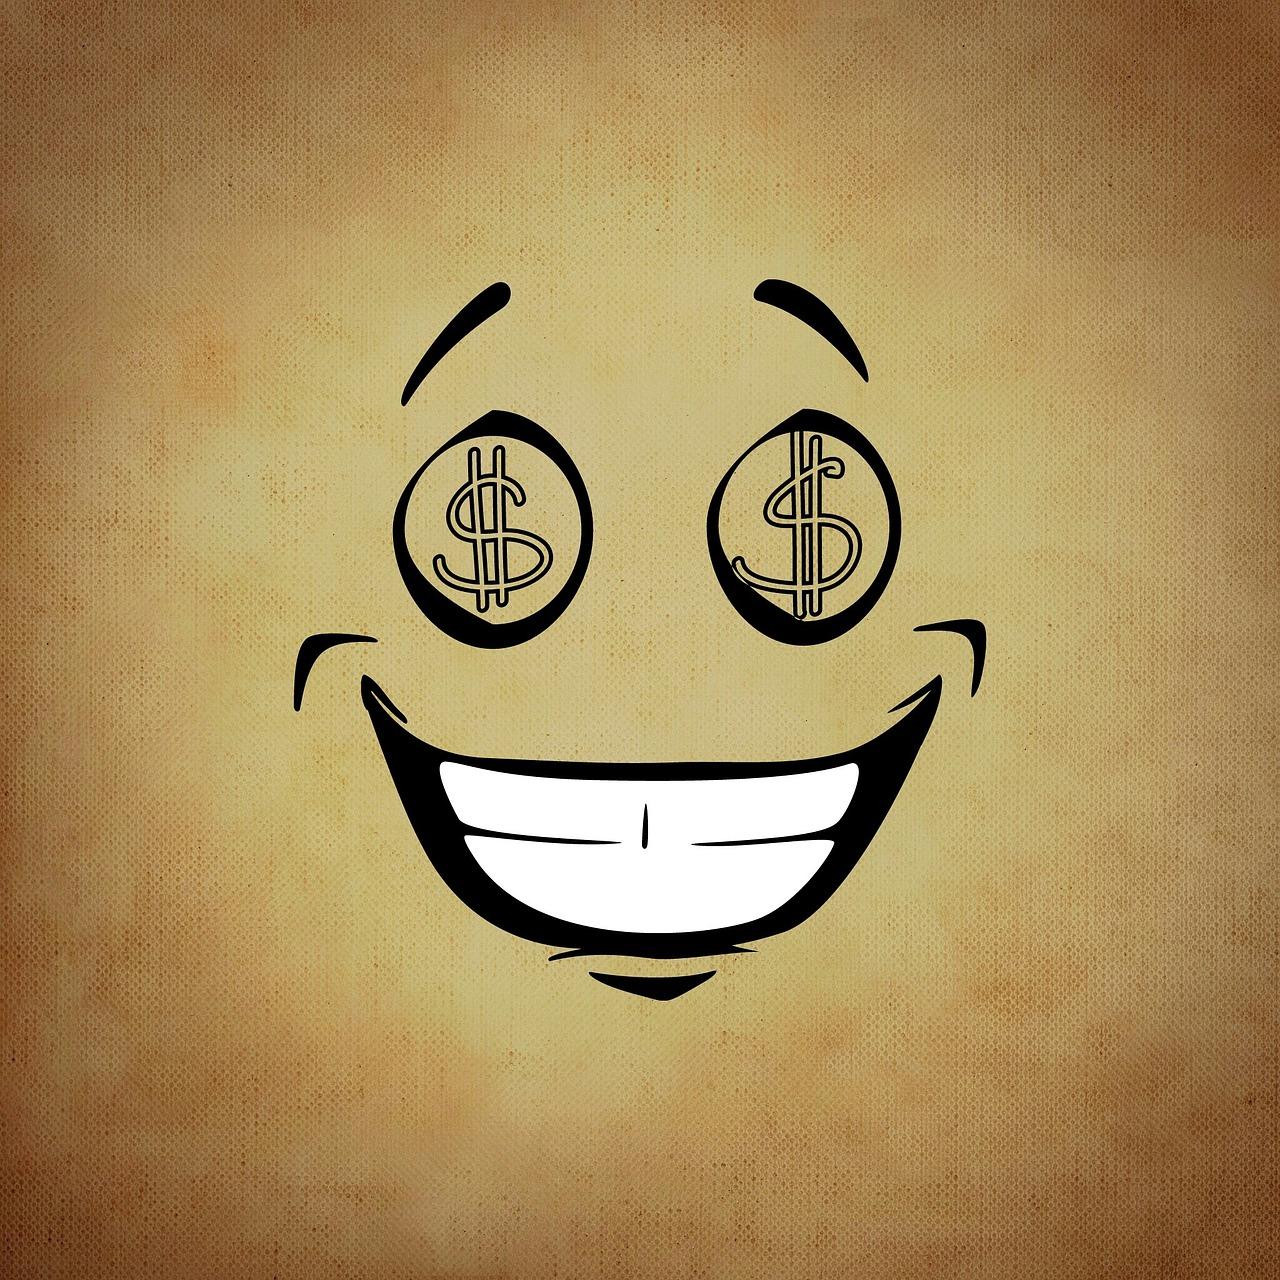 Smiley Emoticon Uang Gambar Gratis Di Pixabay